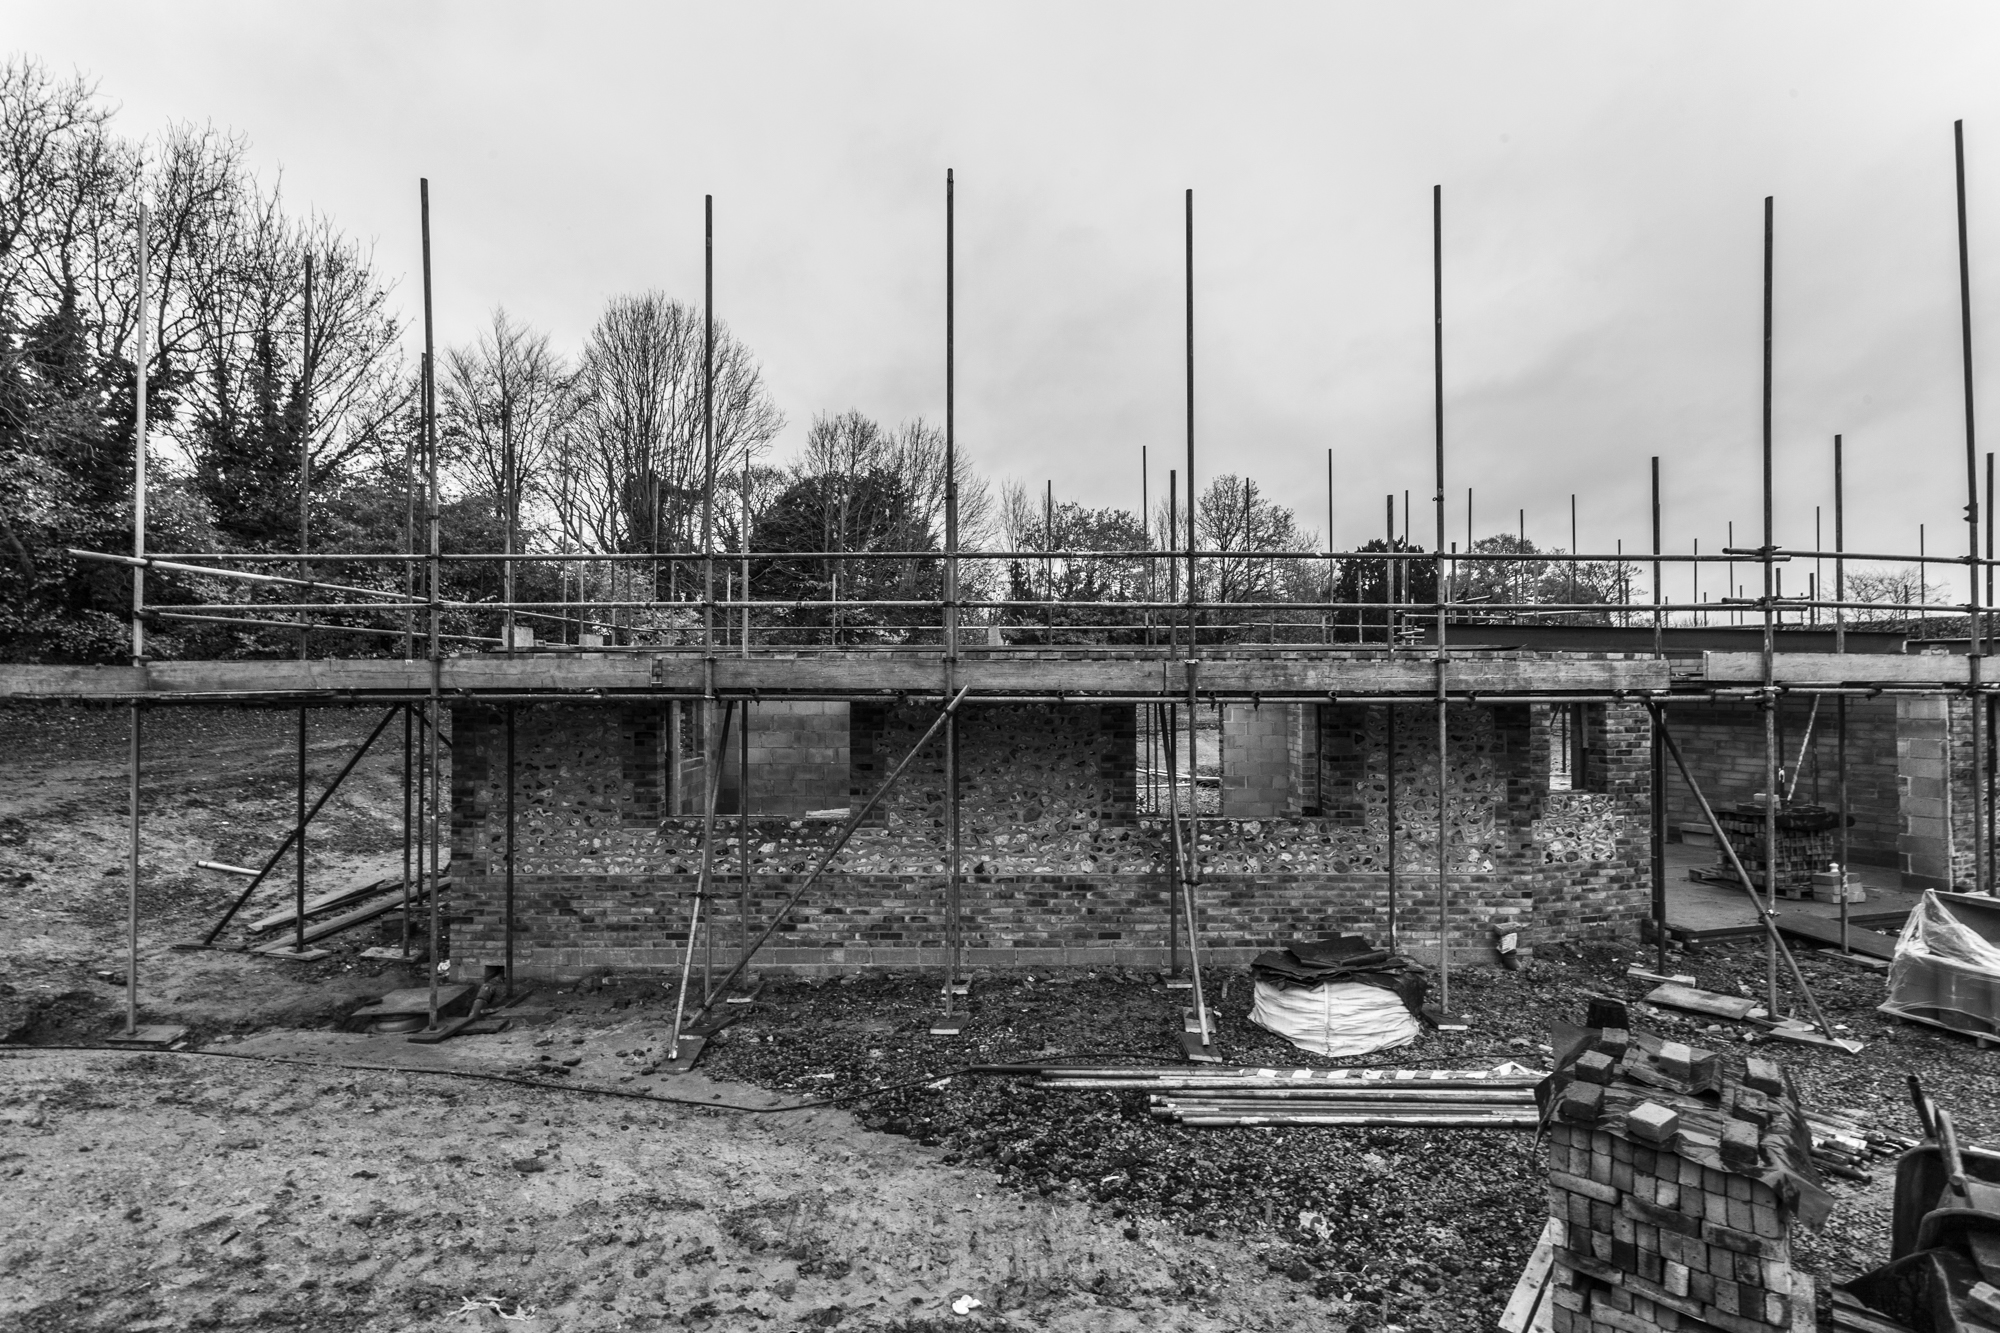 FlinthurstHouse_Construction_10.jpg